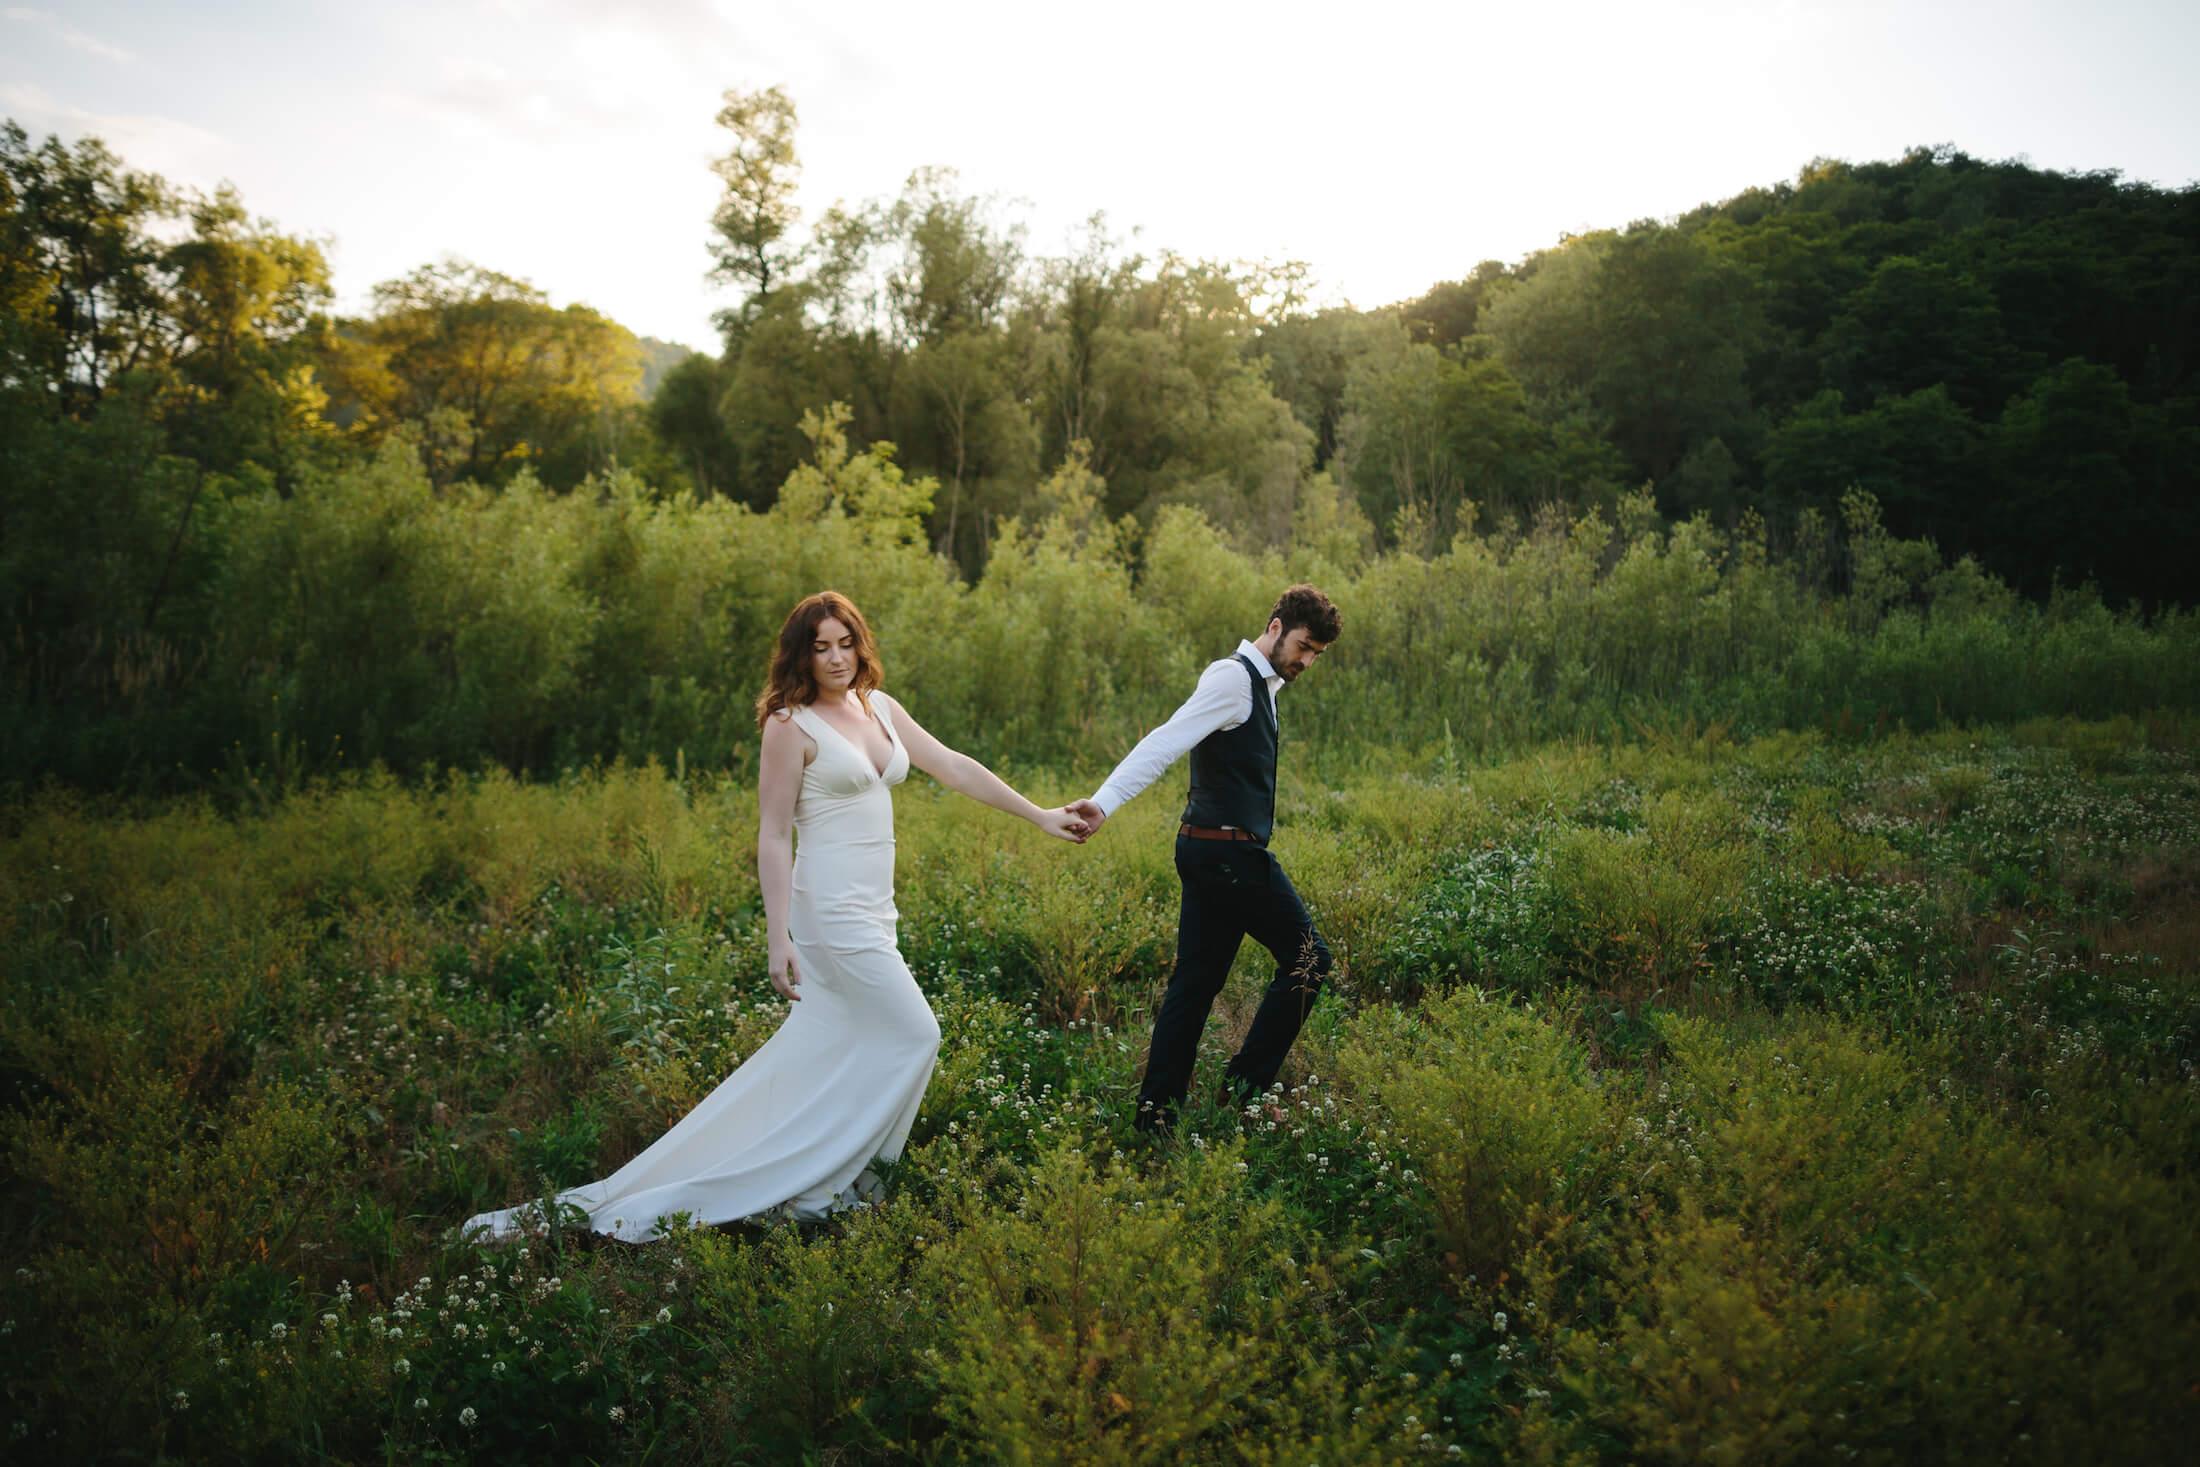 engle-olson-ray-kelly-photography-wisconsin-wedding-107.jpg